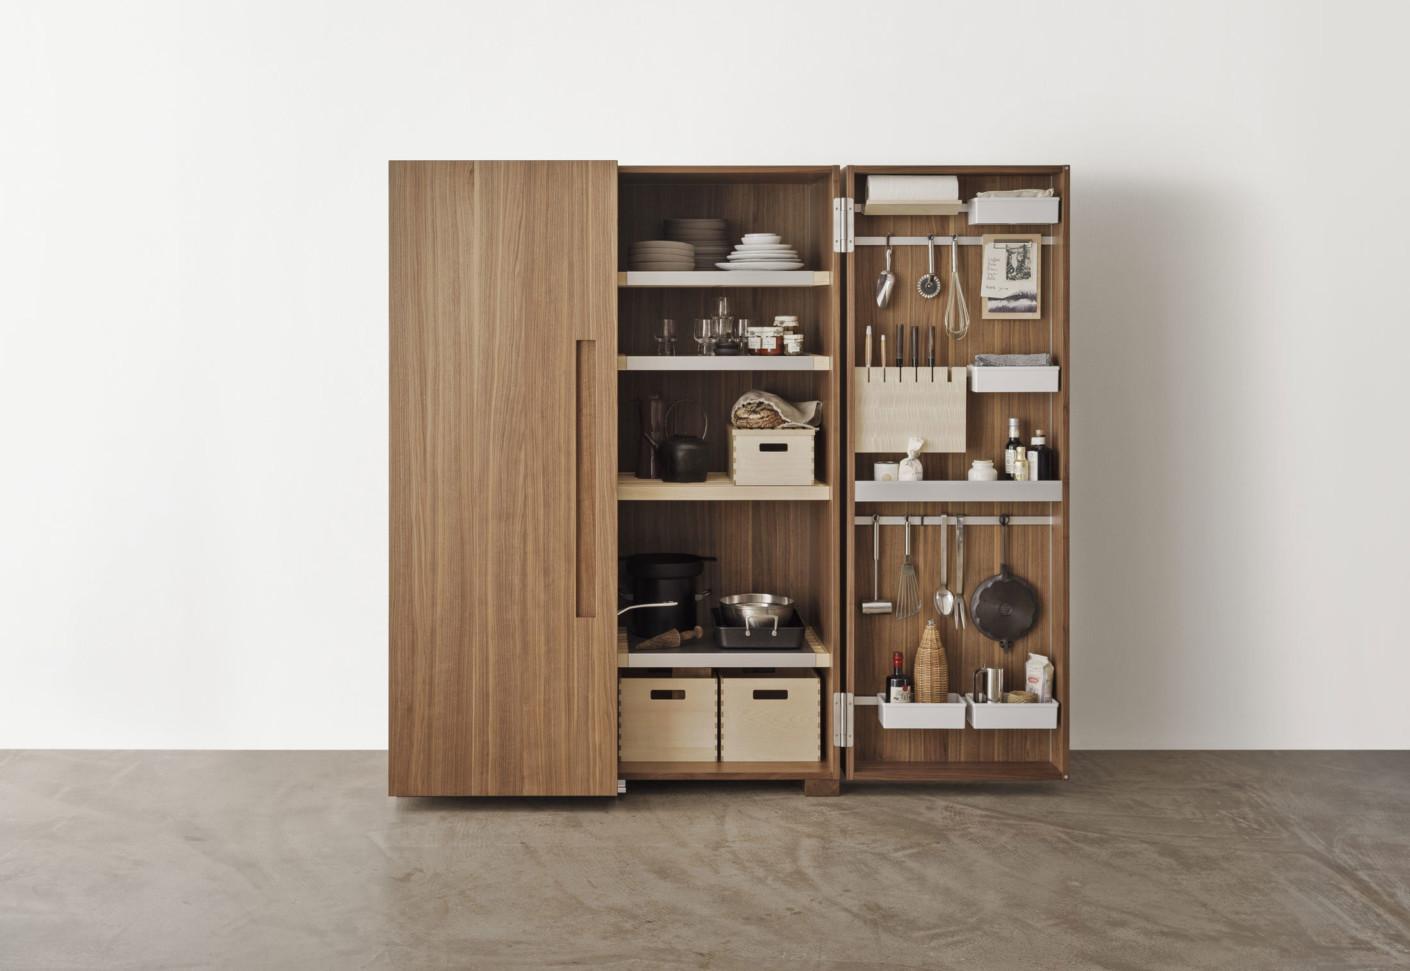 Bulthaup b2 kitchen tool cabinet by bulthaup stylepark - Bulthaup en ...